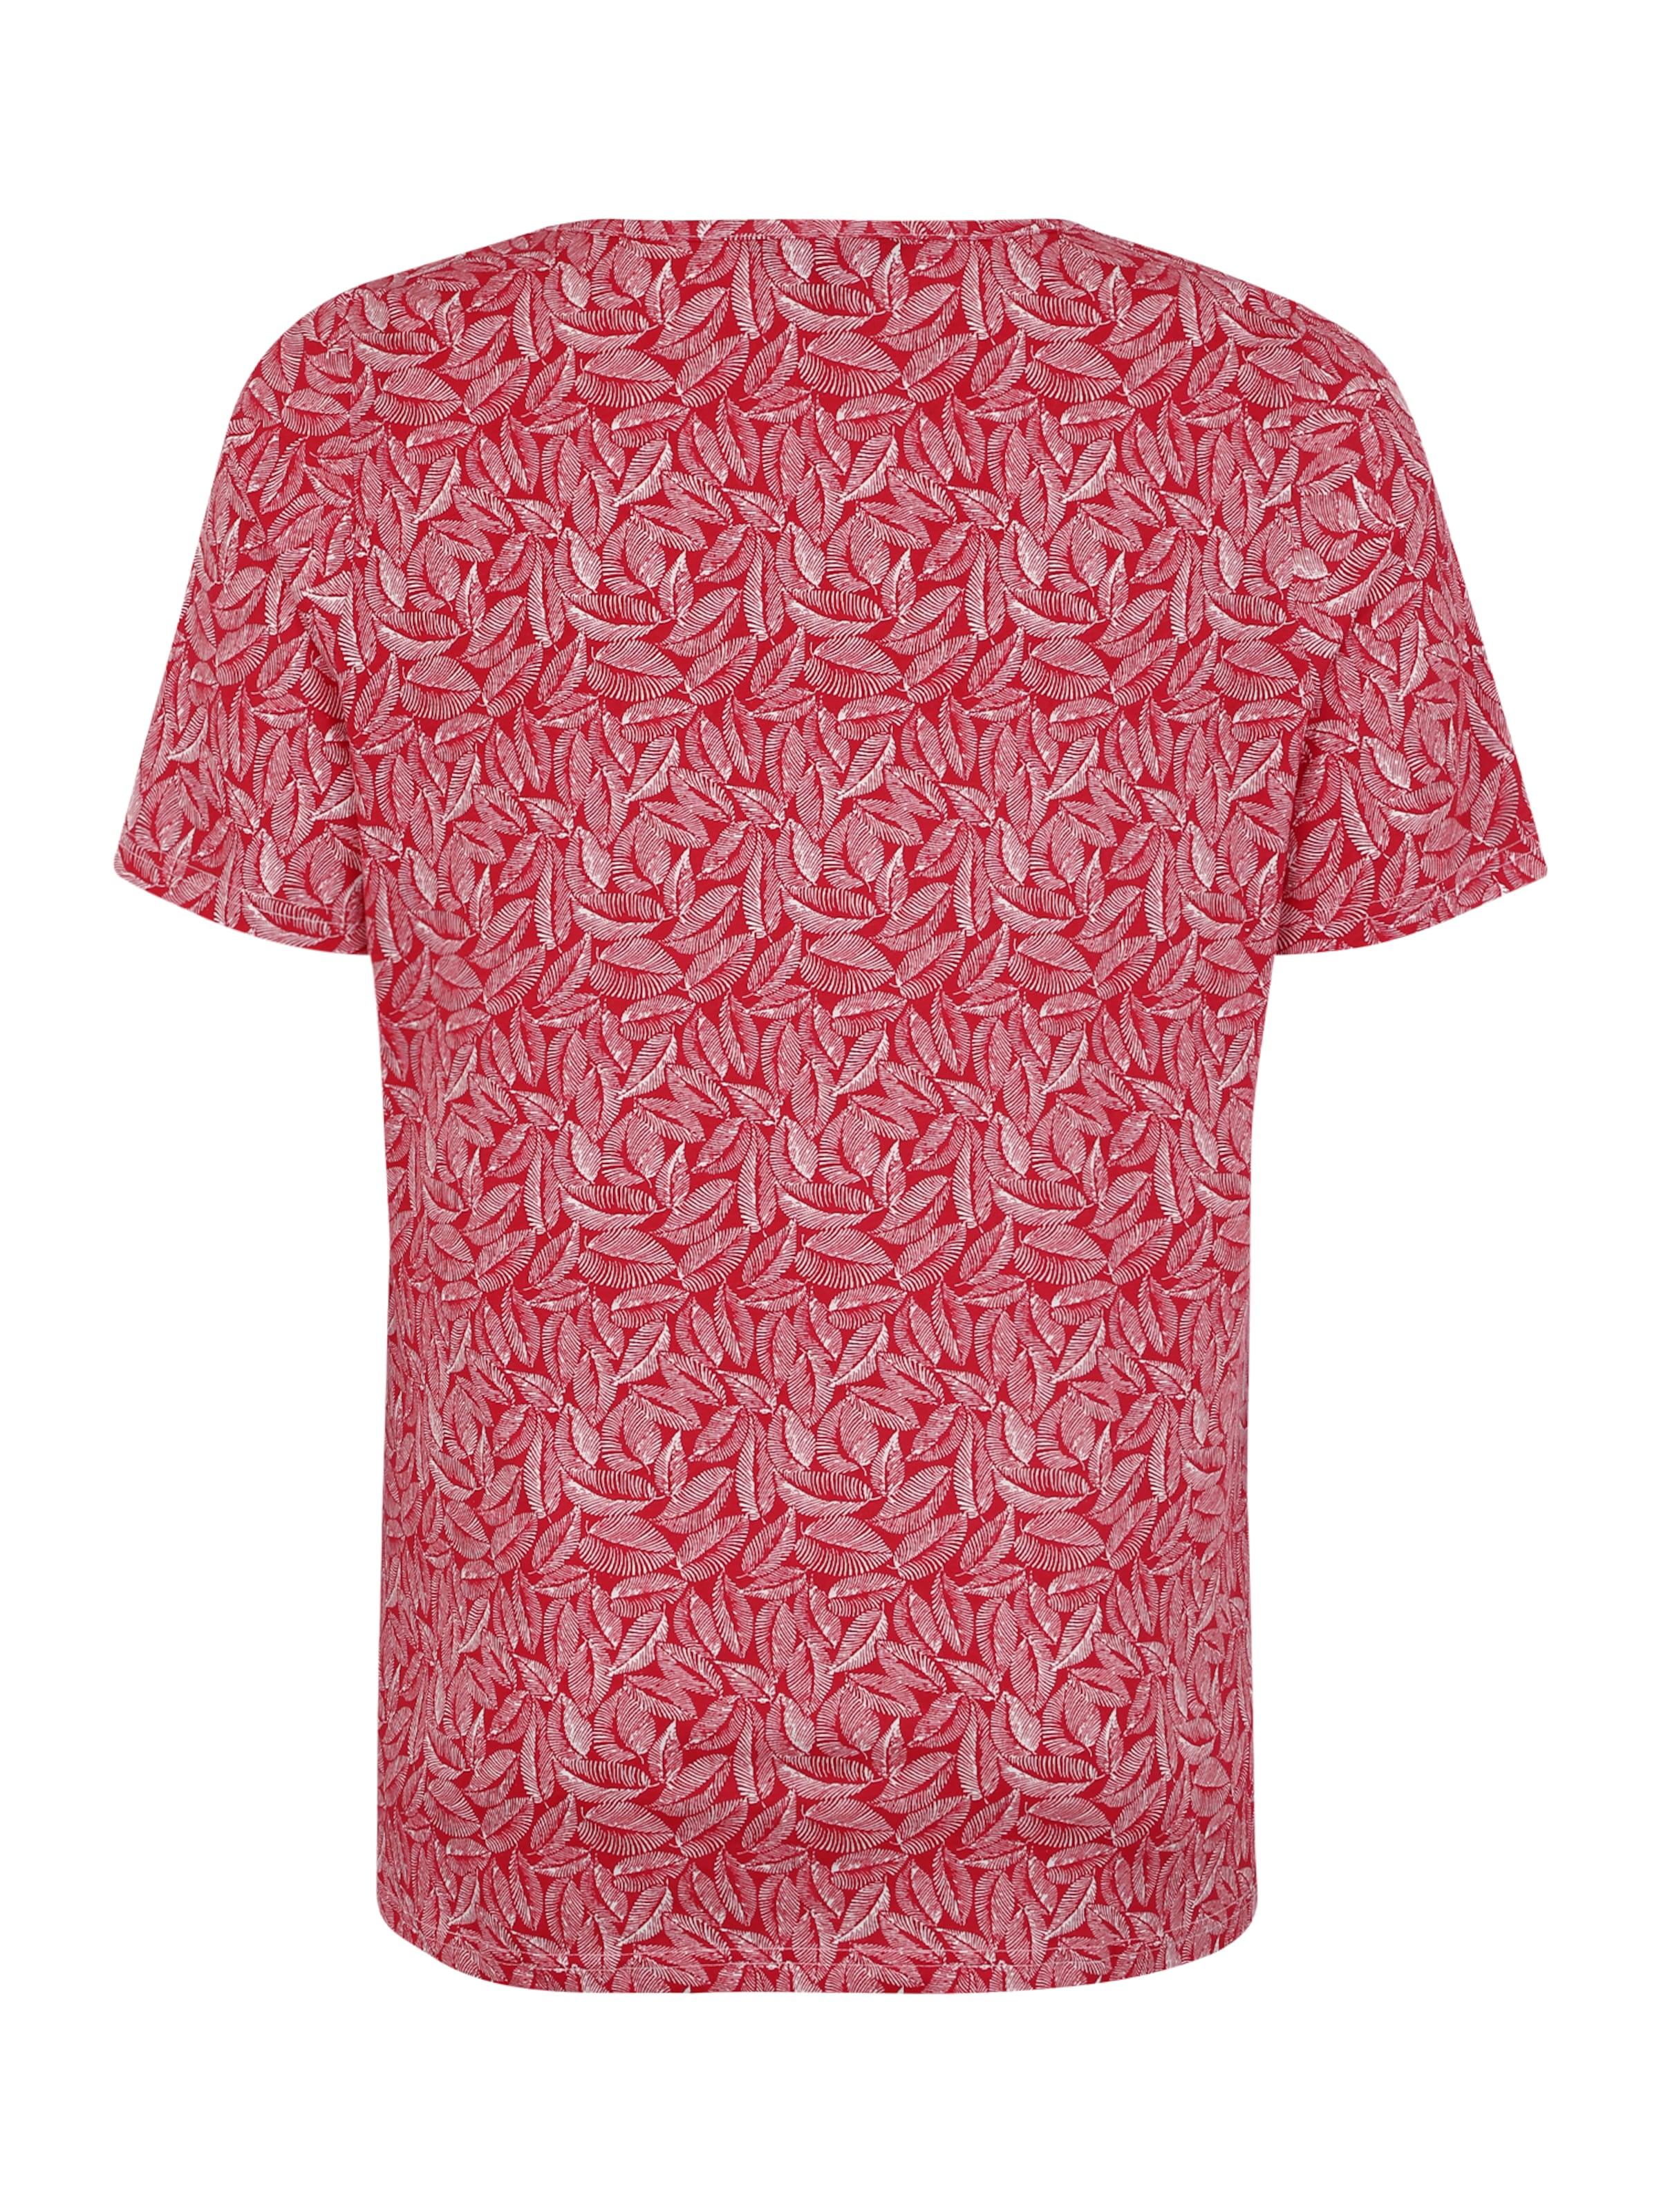 T Ulla Popken shirt RougeBlanc 'minimal' En fgbyYI6v7